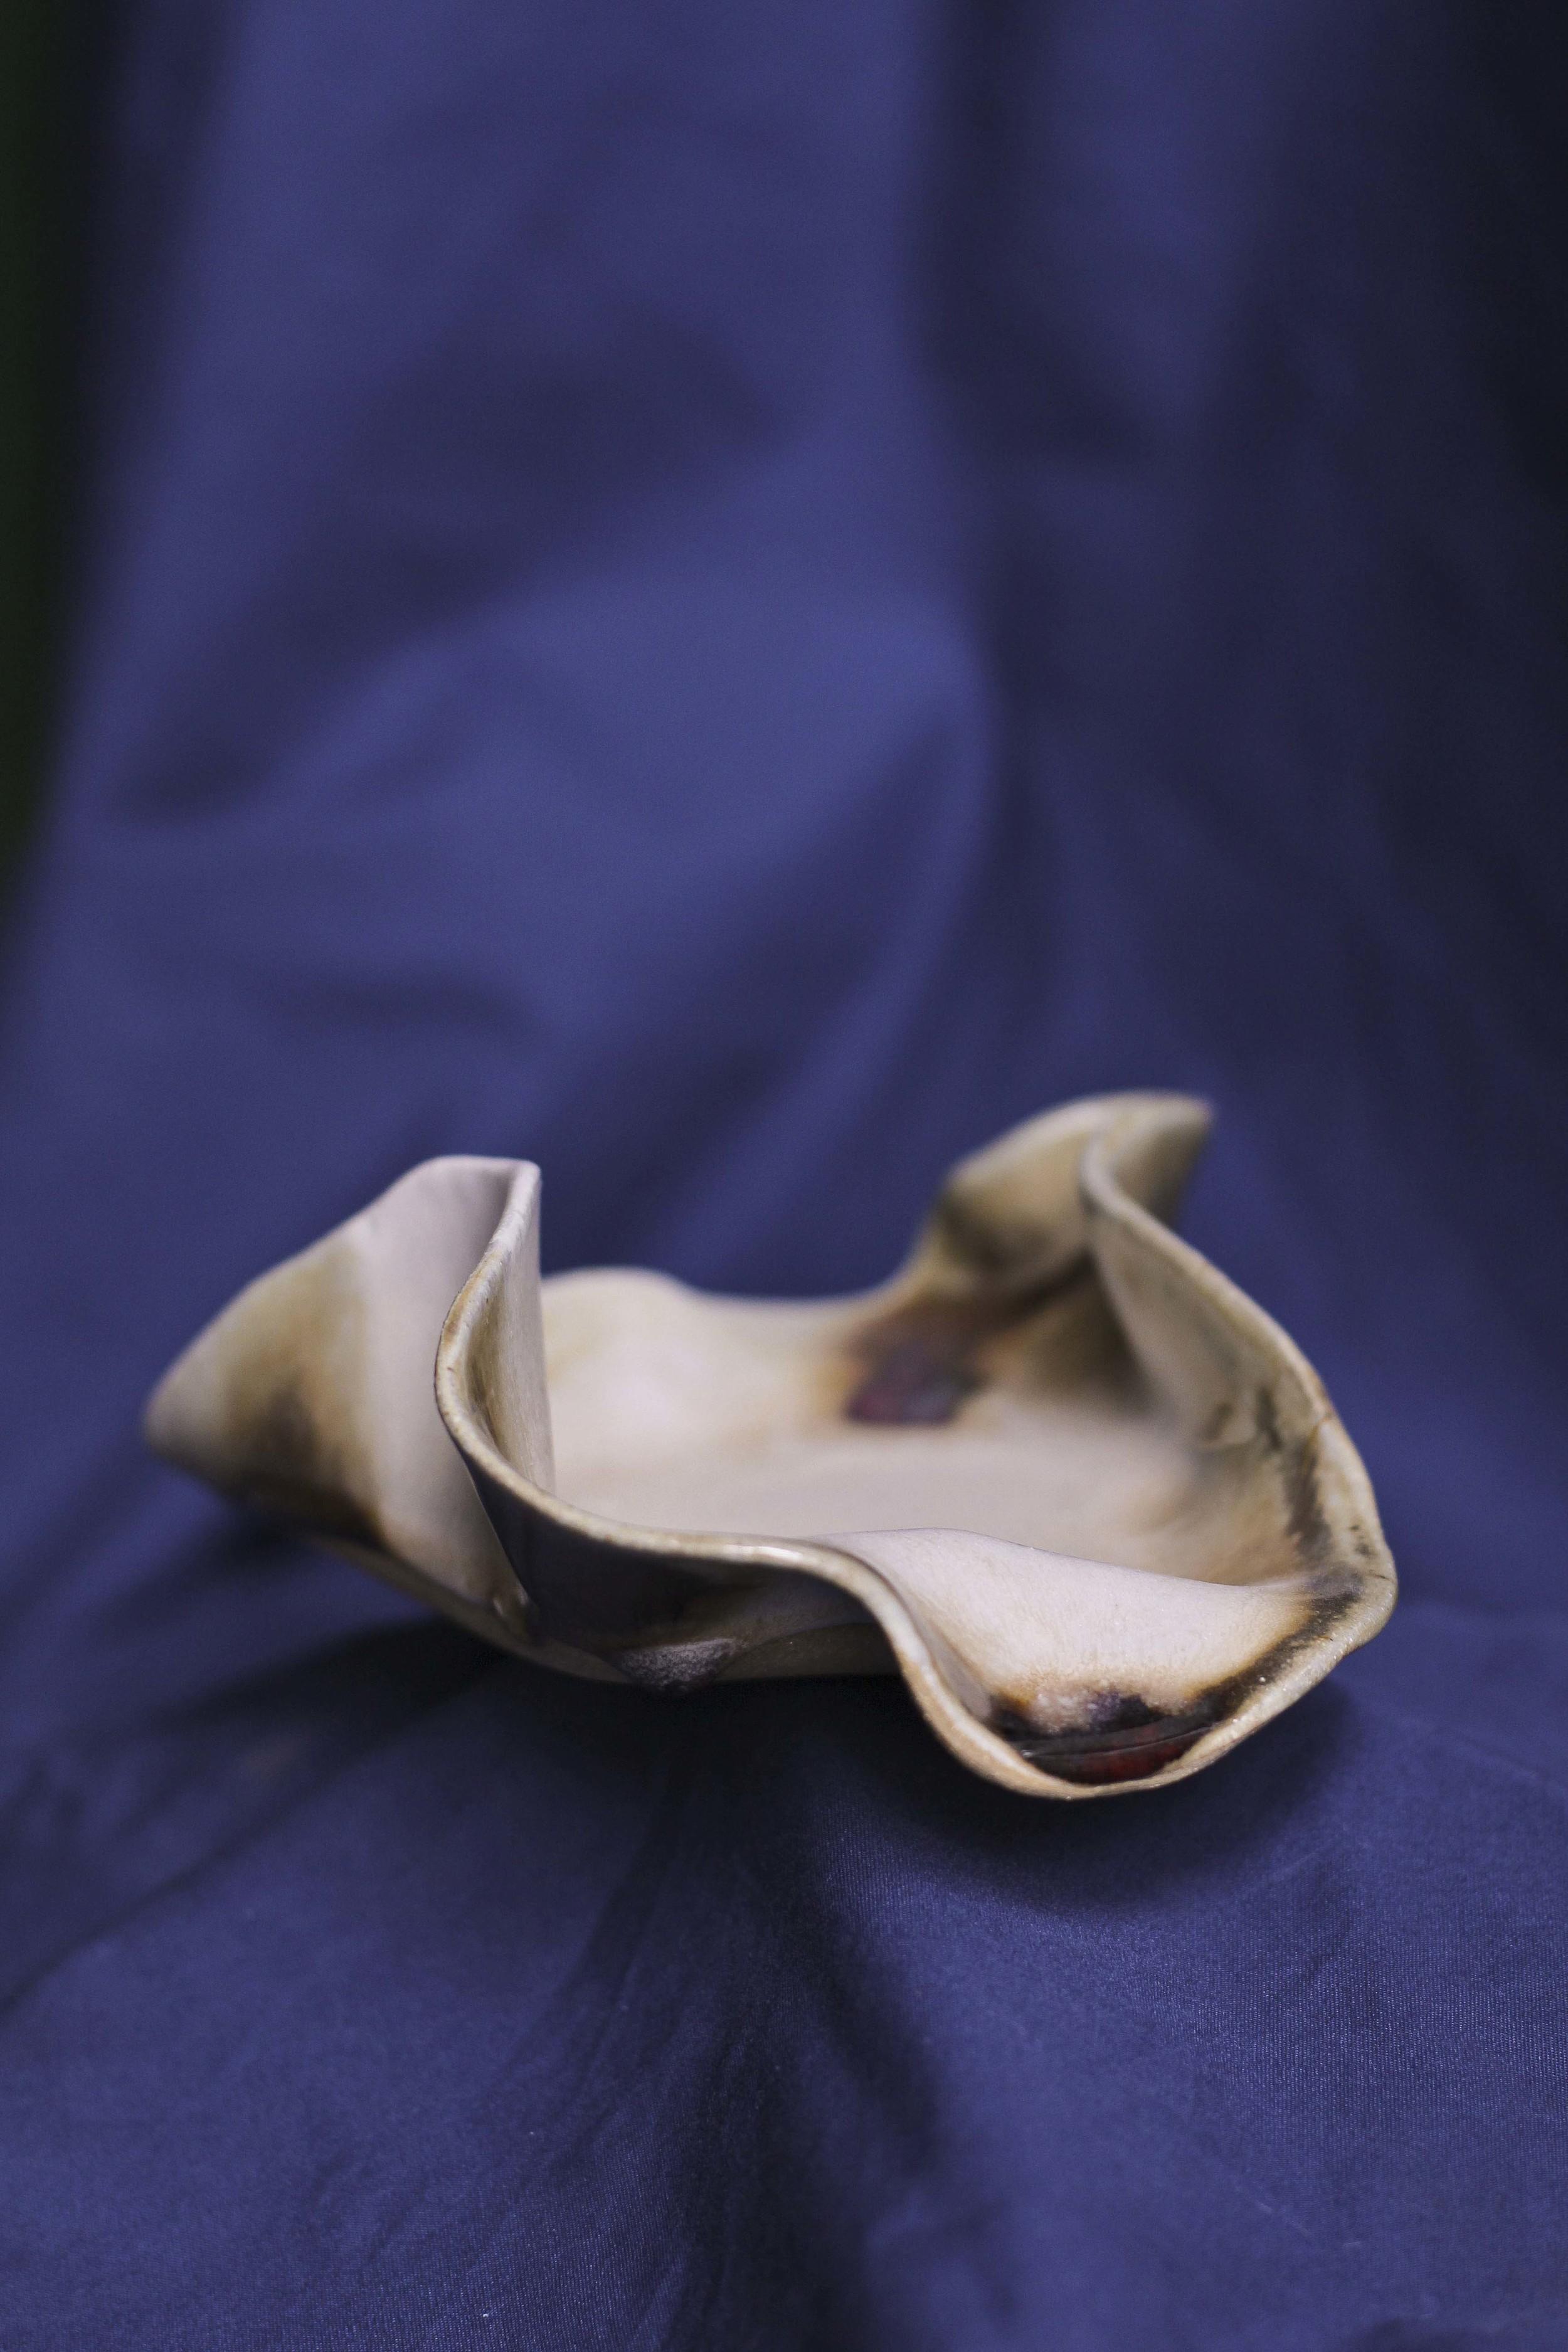 7x4, 2014, Stoneware